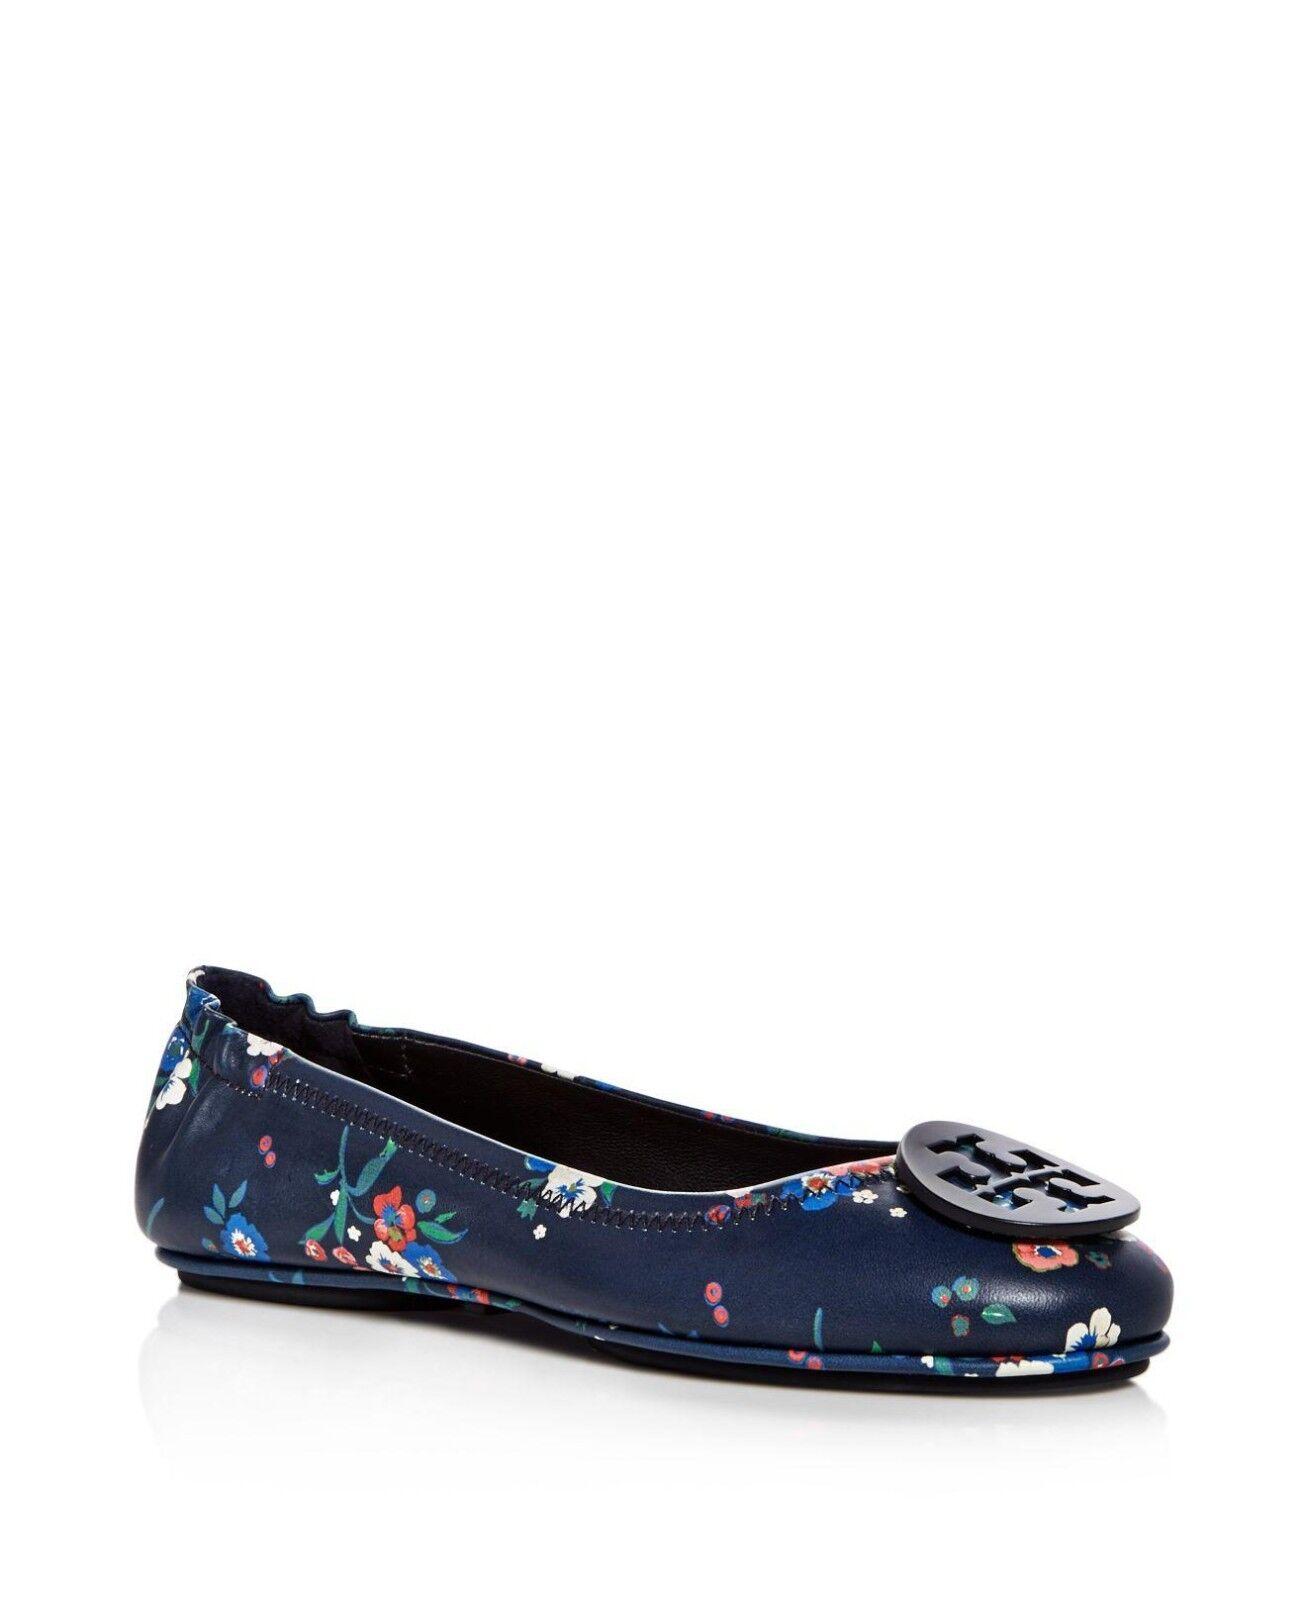 NIB Tory Burch Minnie Floral Travel Logo Ballerina Flats Flats Flats shoes PANSY 9.5 M fdfeab